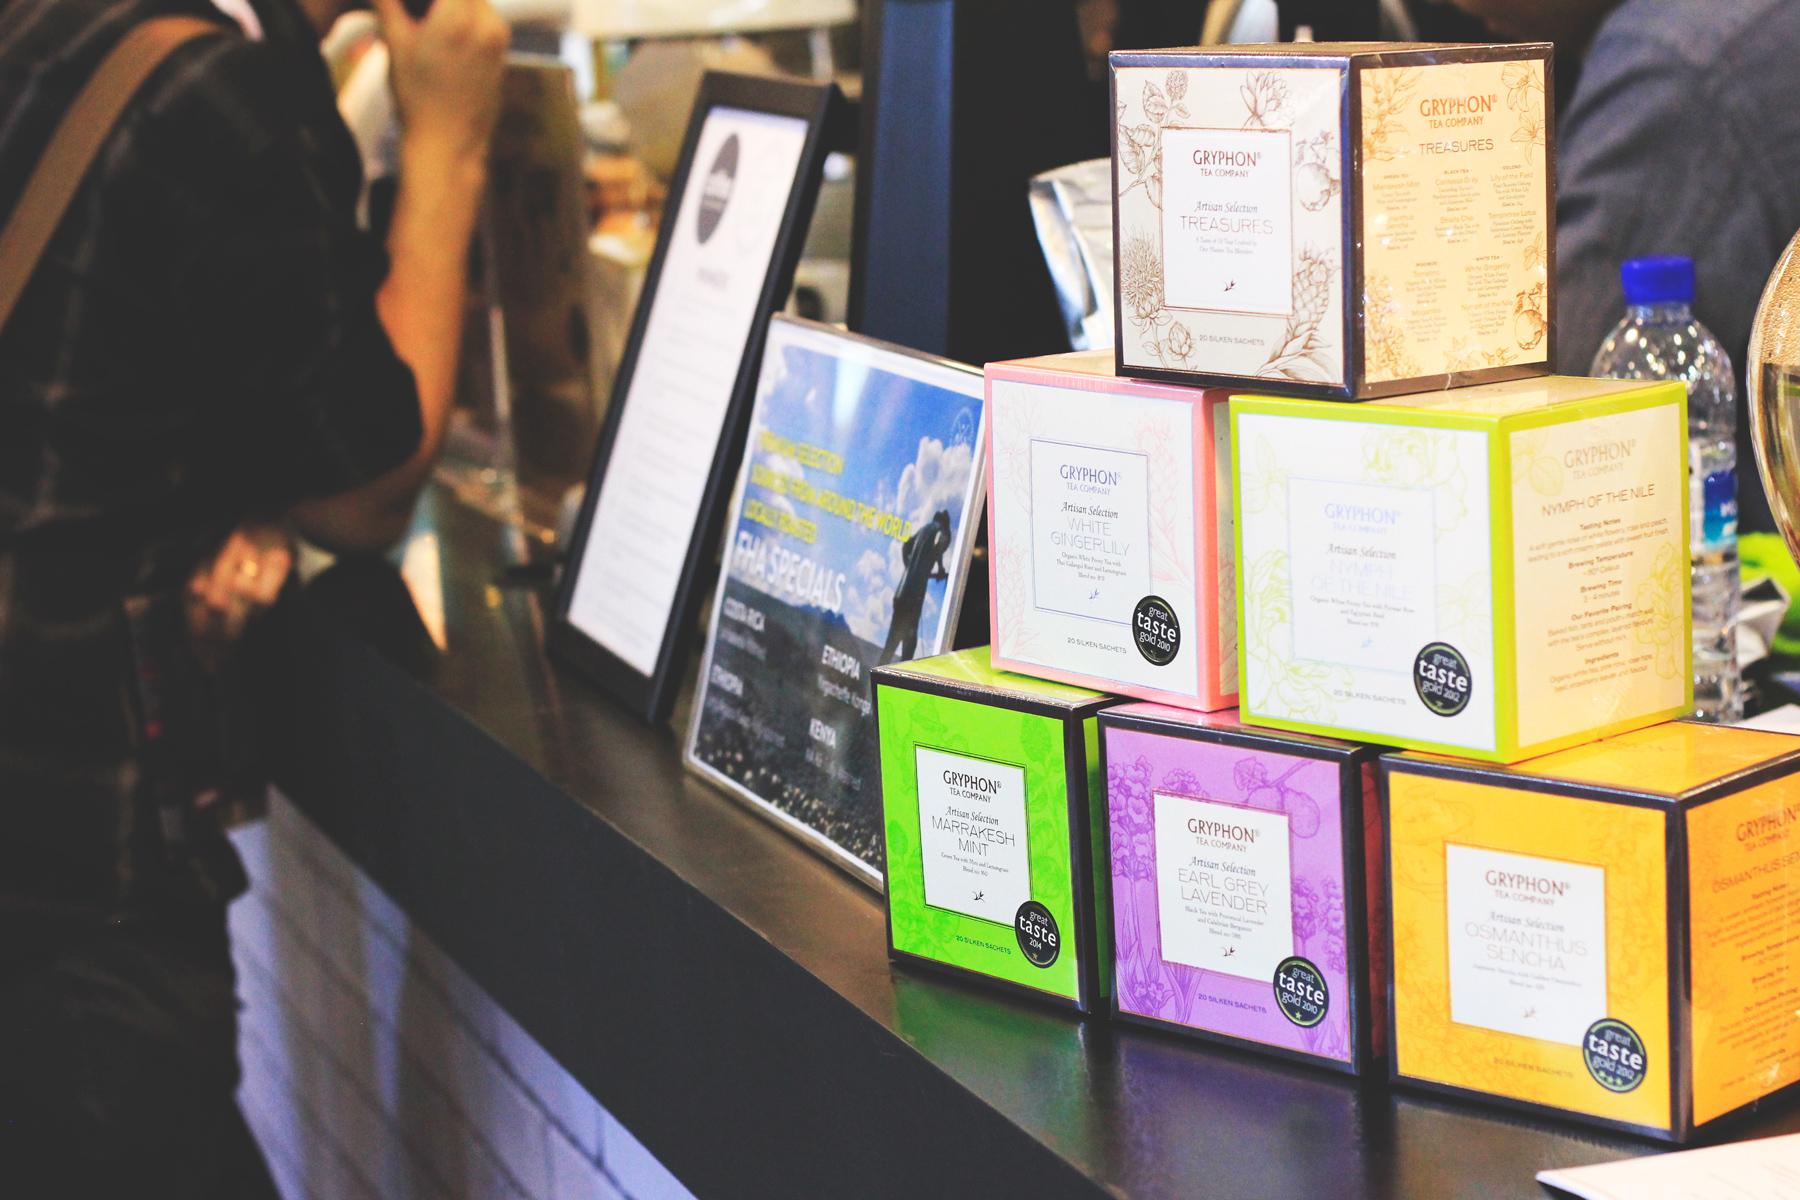 Grryphon Tea Company - Food & Hotel Asia 2016